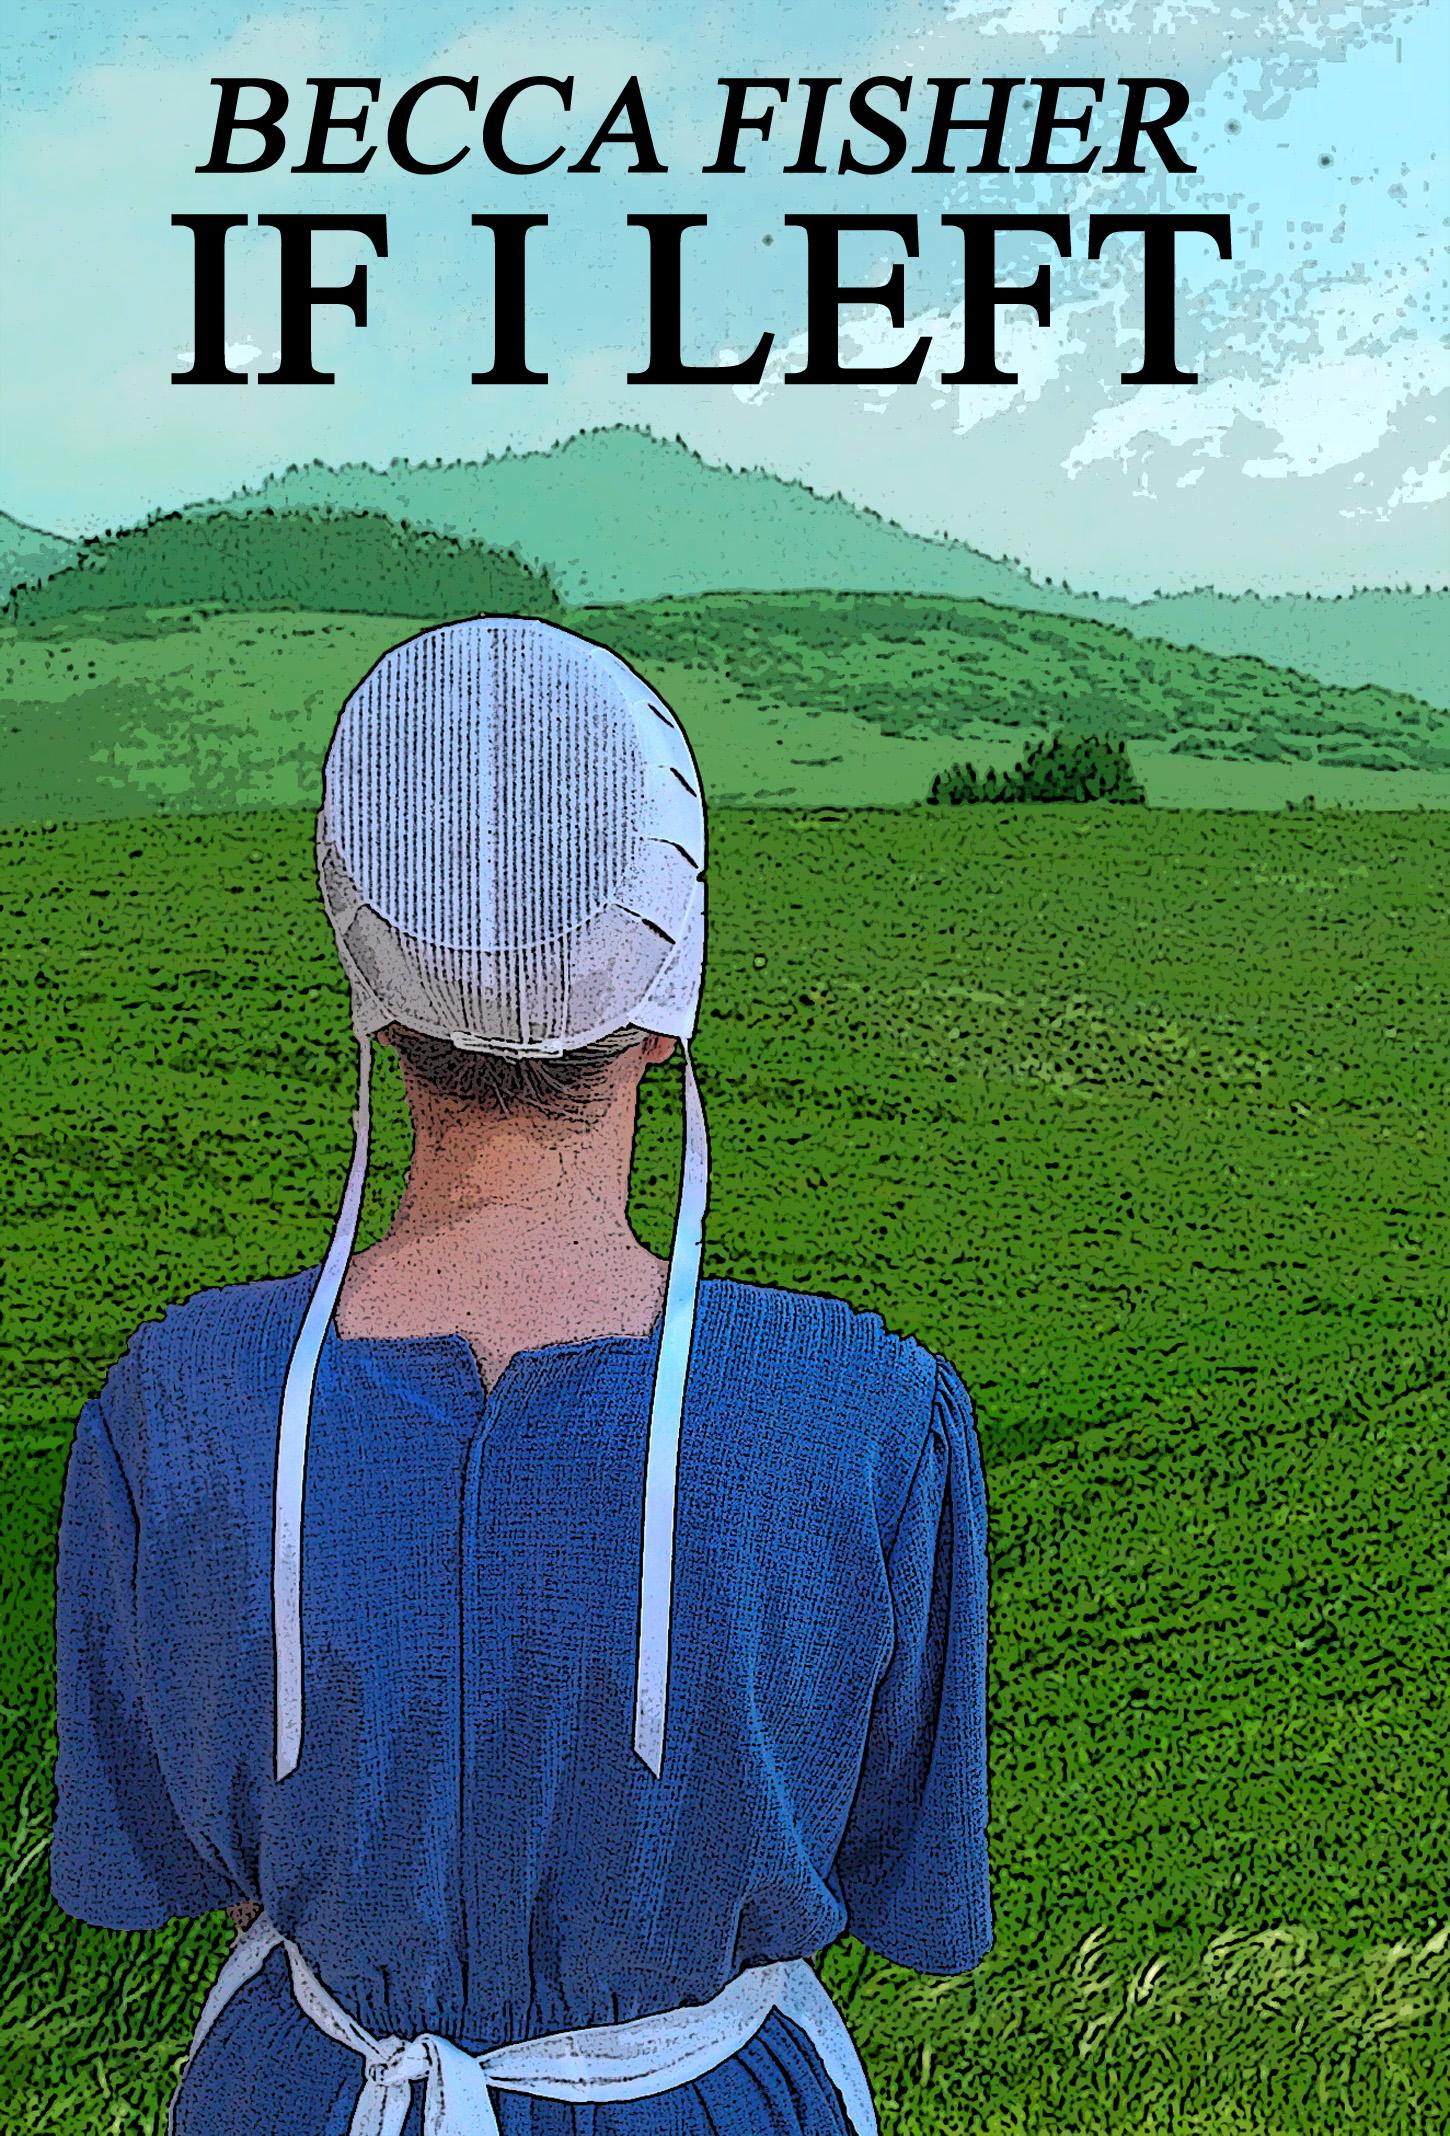 Becca Fisher - If I Left (Amish Romance)